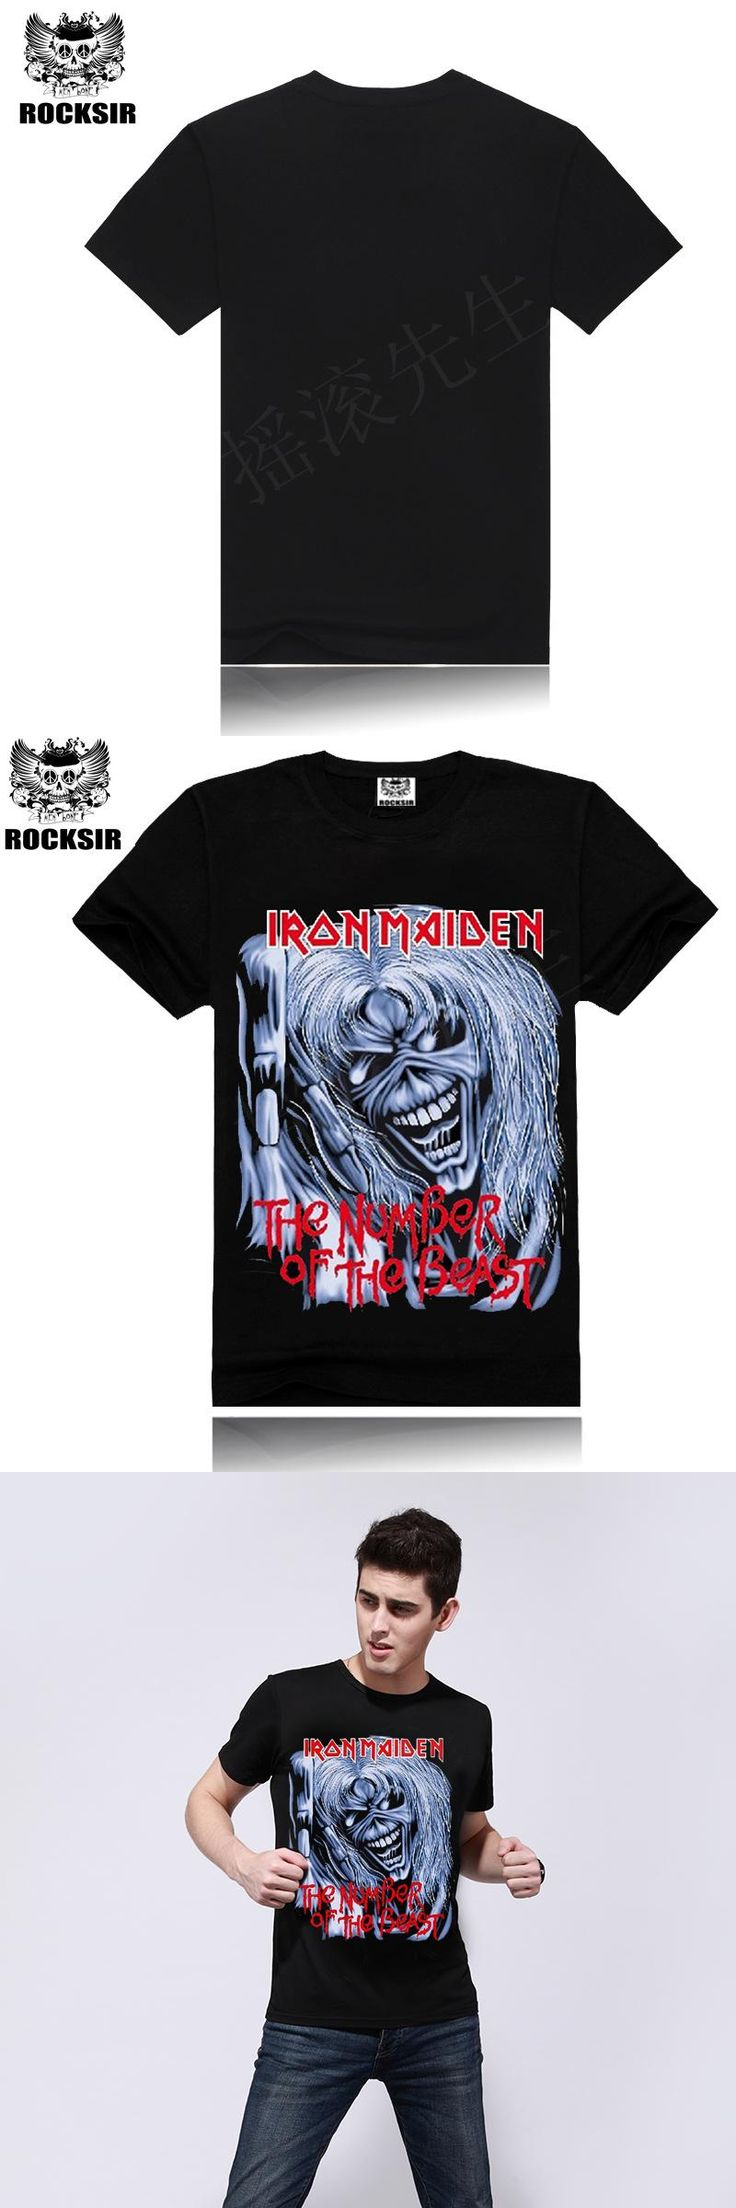 Brand Clothing Tee Men T Shirt Black T-Shirt 100% Cotton Skull Print Heavy Metal Rock Hip Hop Clothing Black Metallica Man Tops